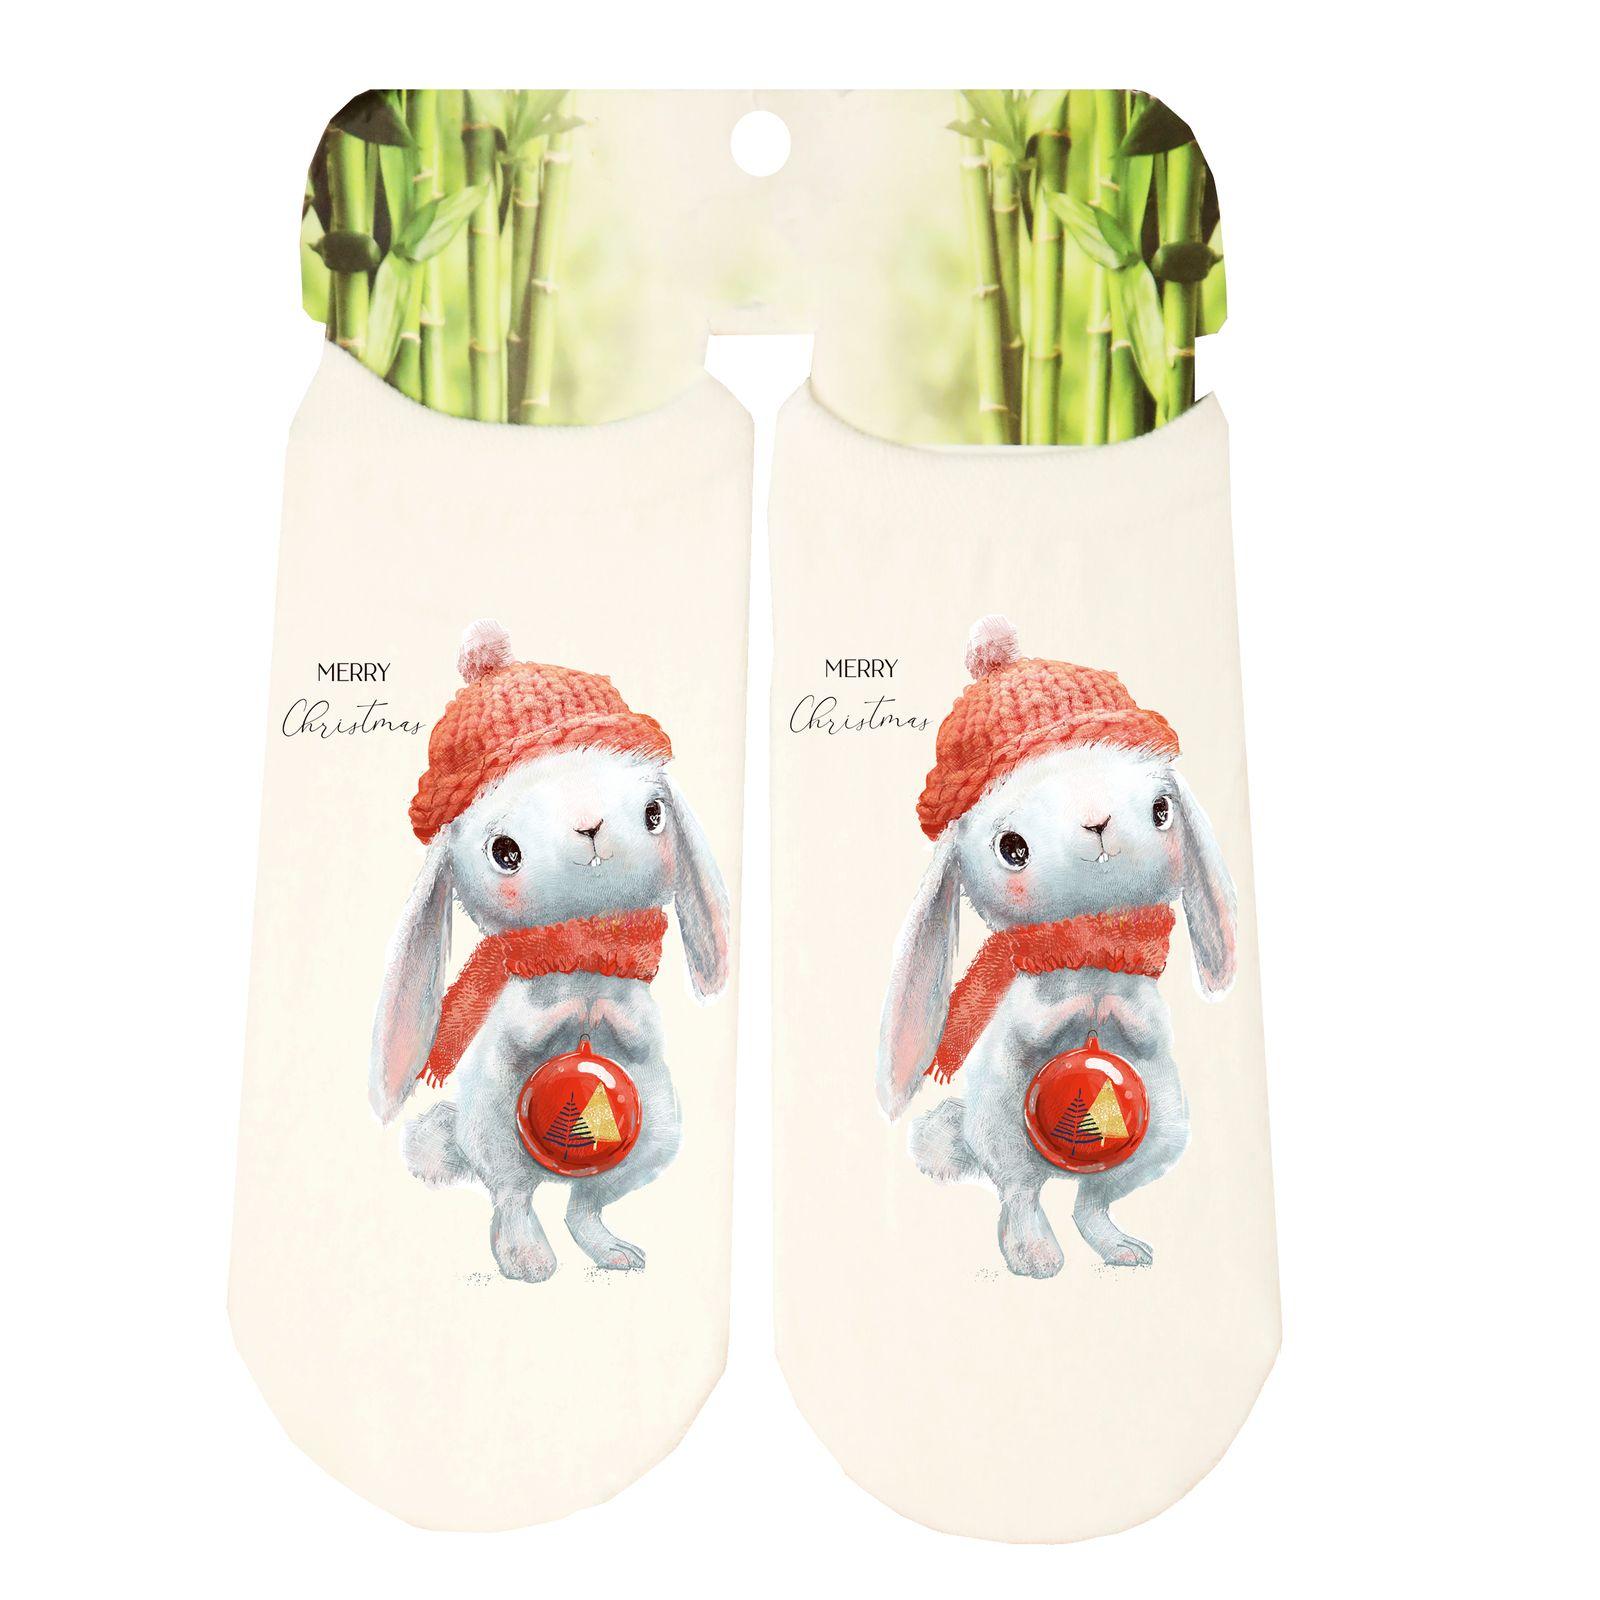 جوراب پسرانه طرح خرگوش کد SCb55 -  - 3